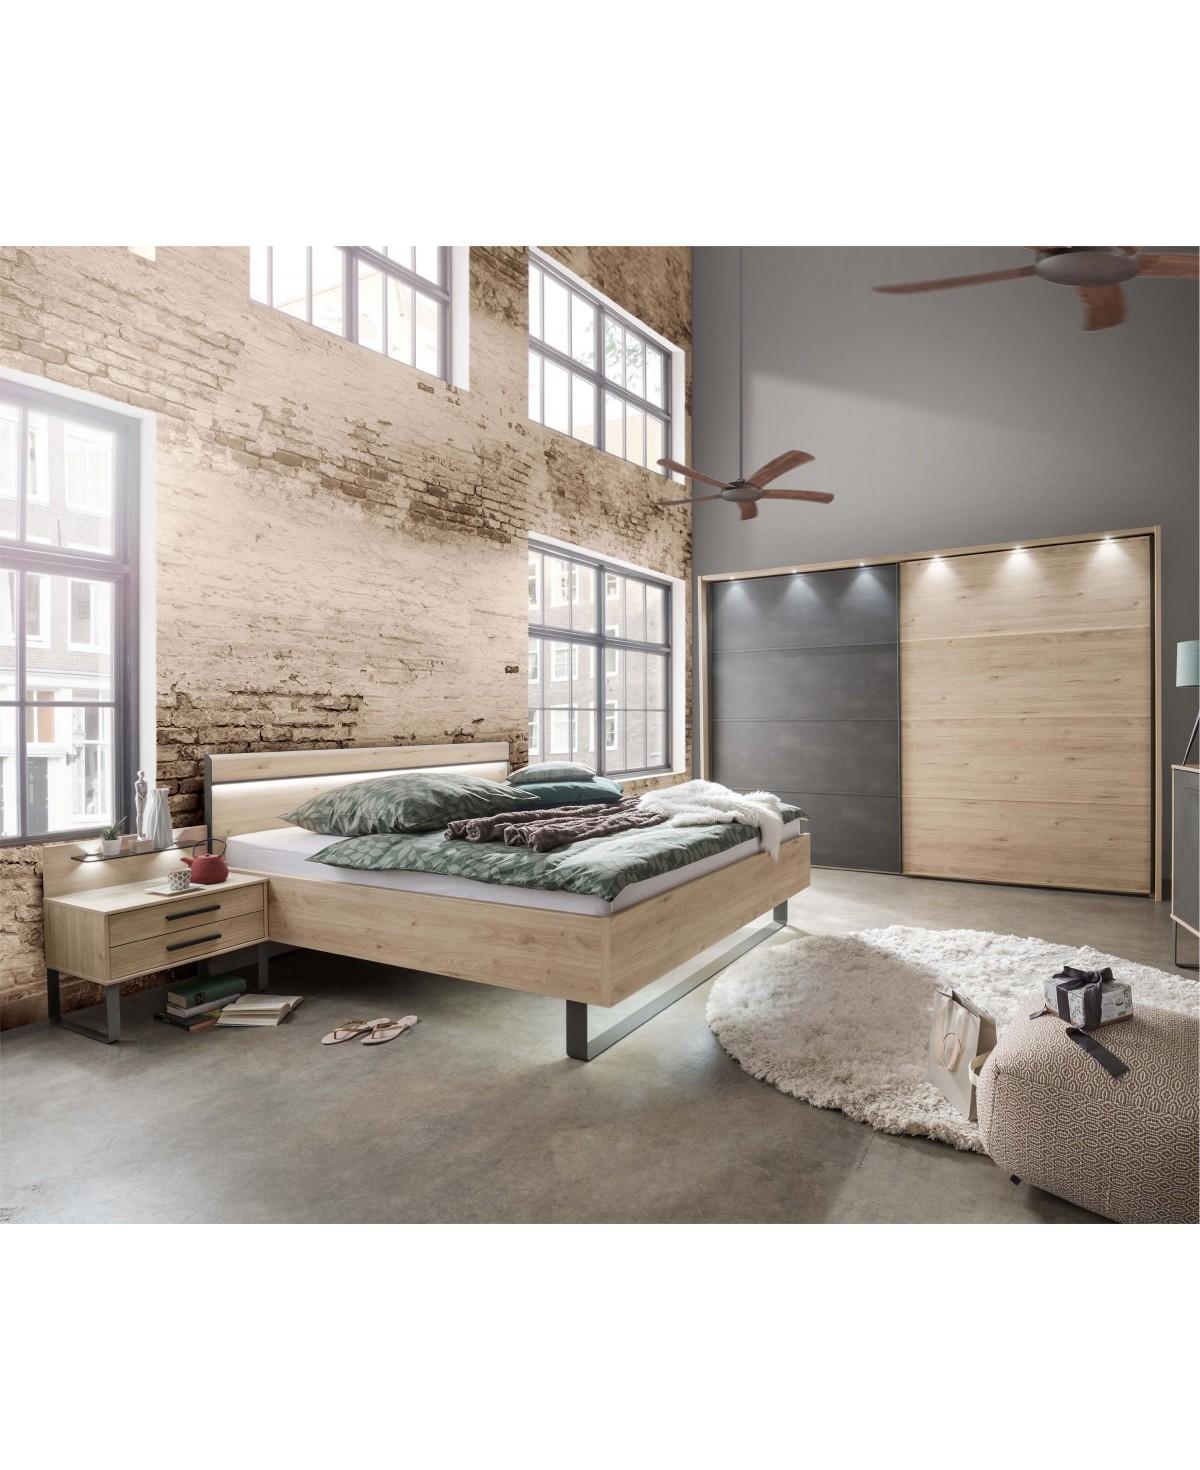 Full Size of Schlafzimmer Betten Wiemann Brssel Schrank Bett Nachttisch 160x200 Kommoden Massivholz Wandlampe Gardinen Für Köln überlänge Outlet Komplett Günstig Mit Schlafzimmer Schlafzimmer Betten